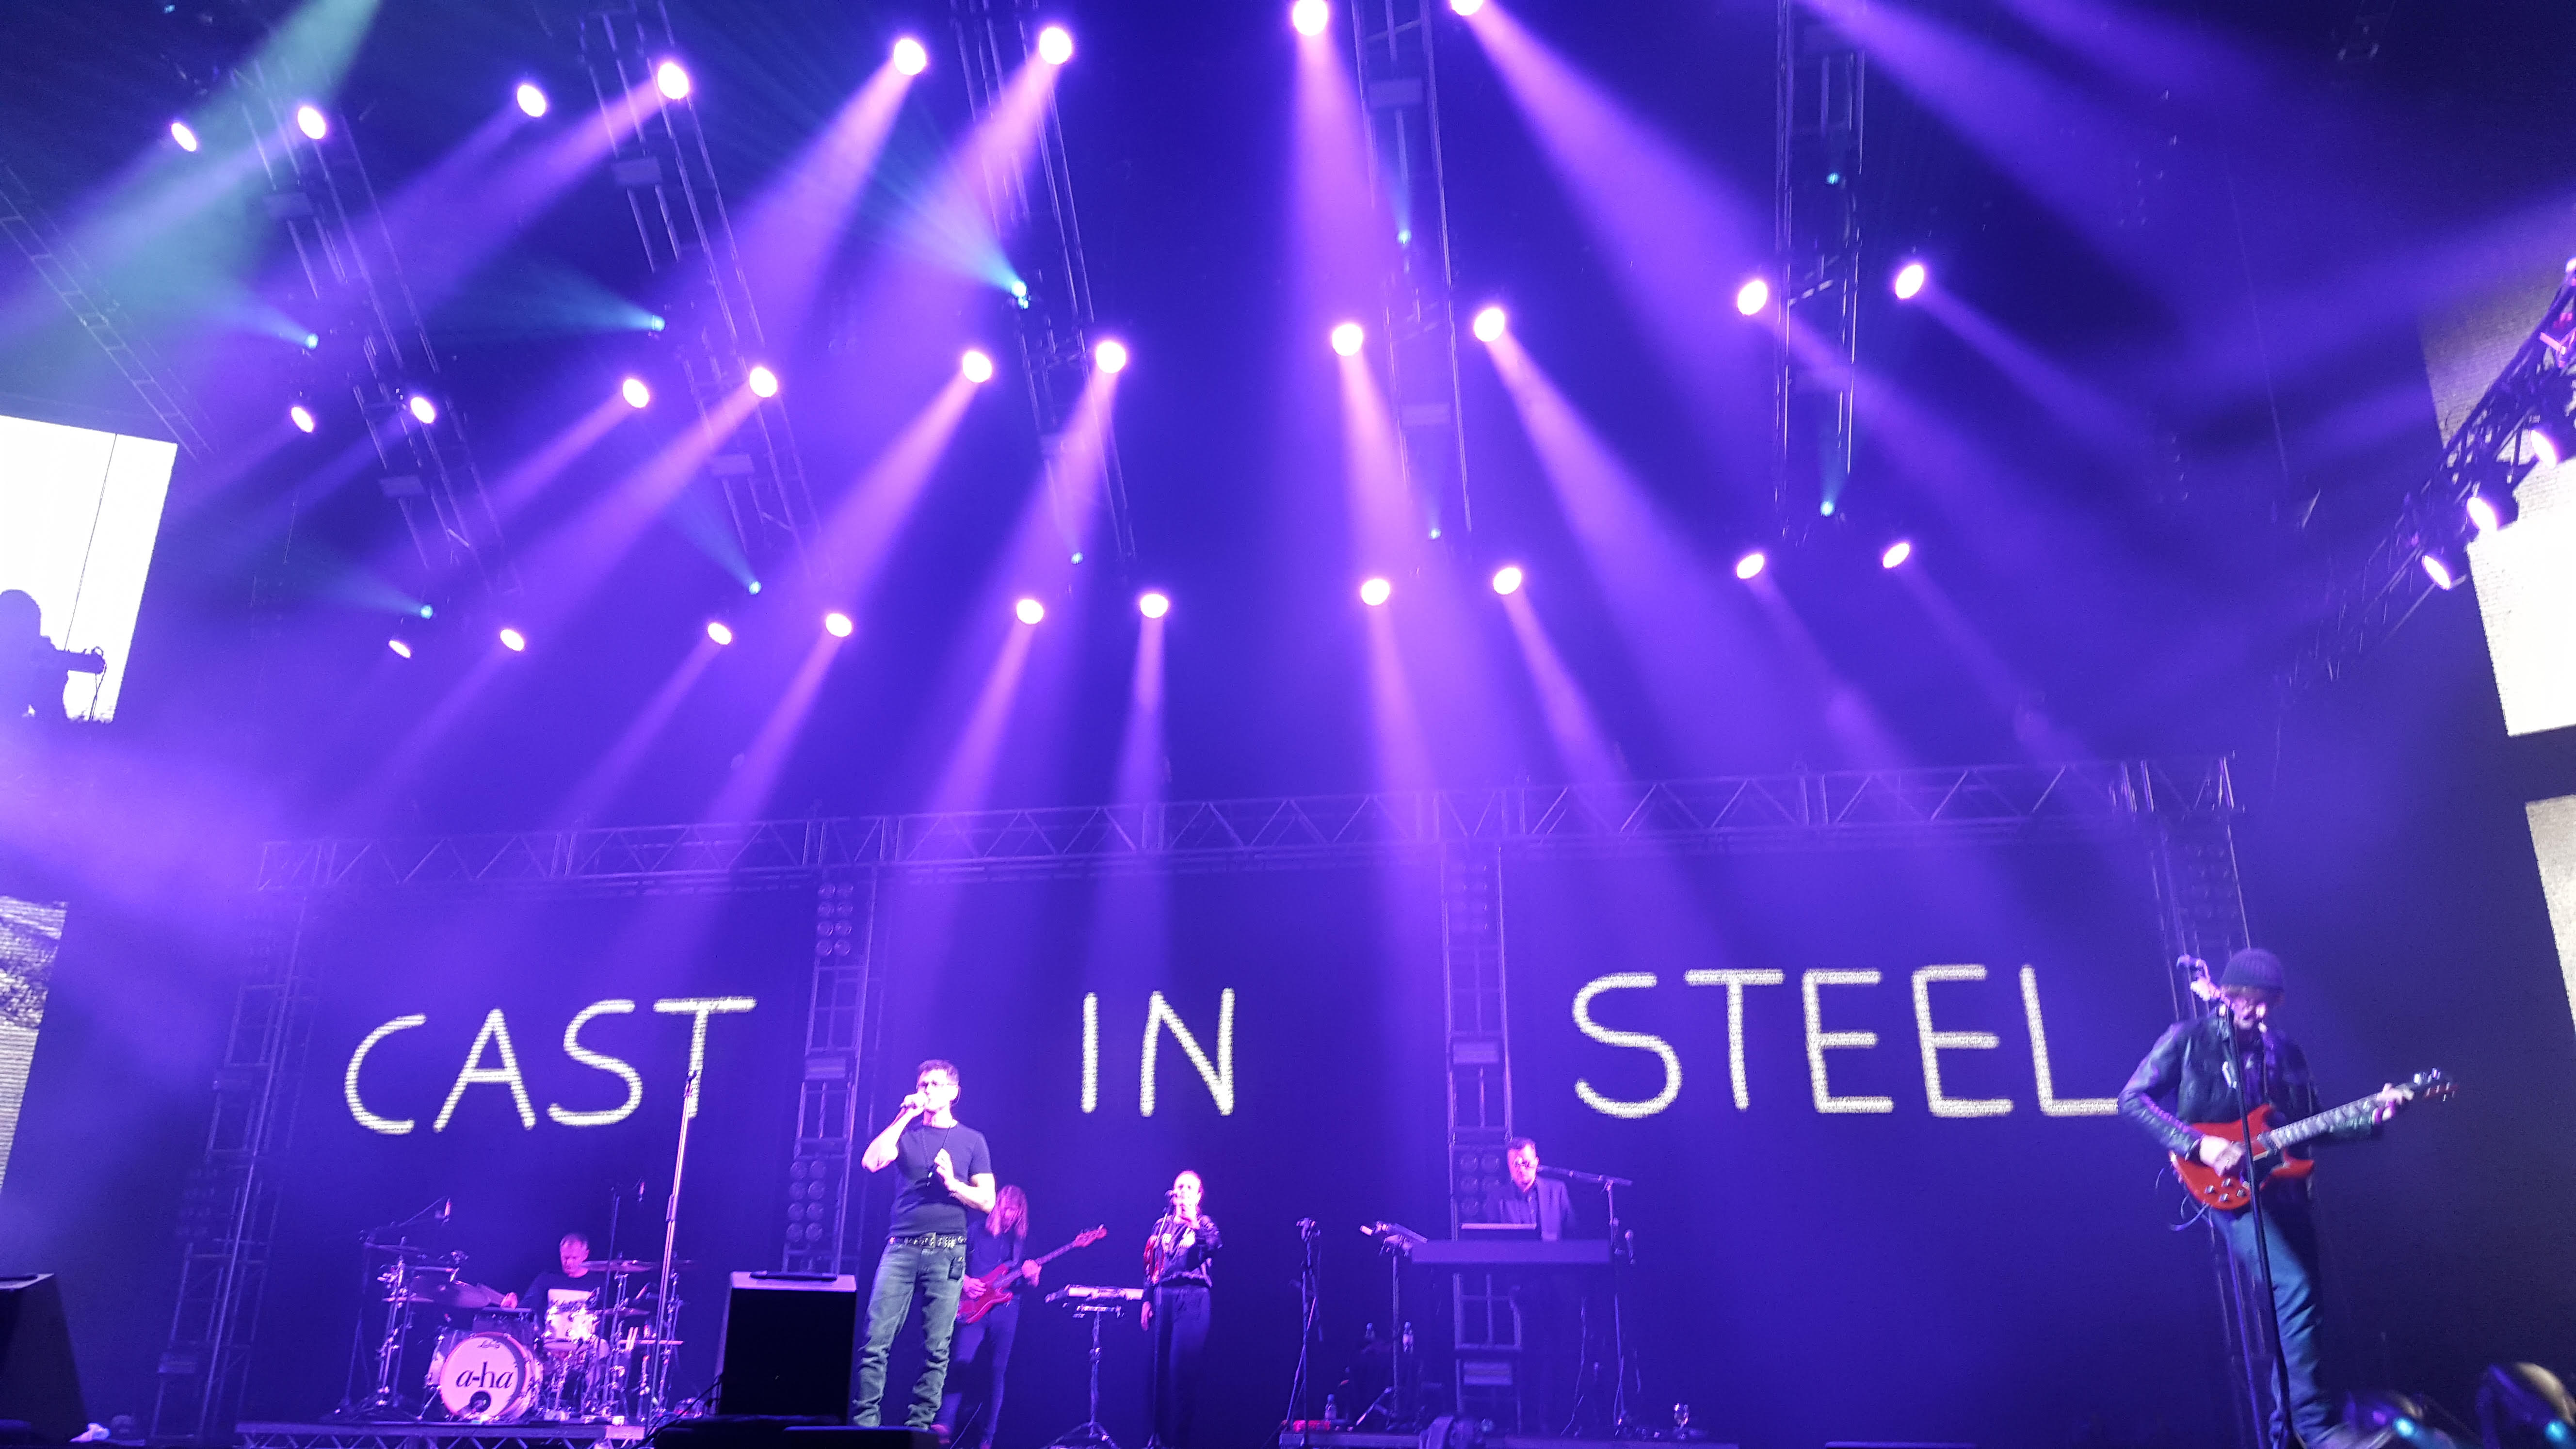 a-ha Cast in steel tour - Oslo Spektrum